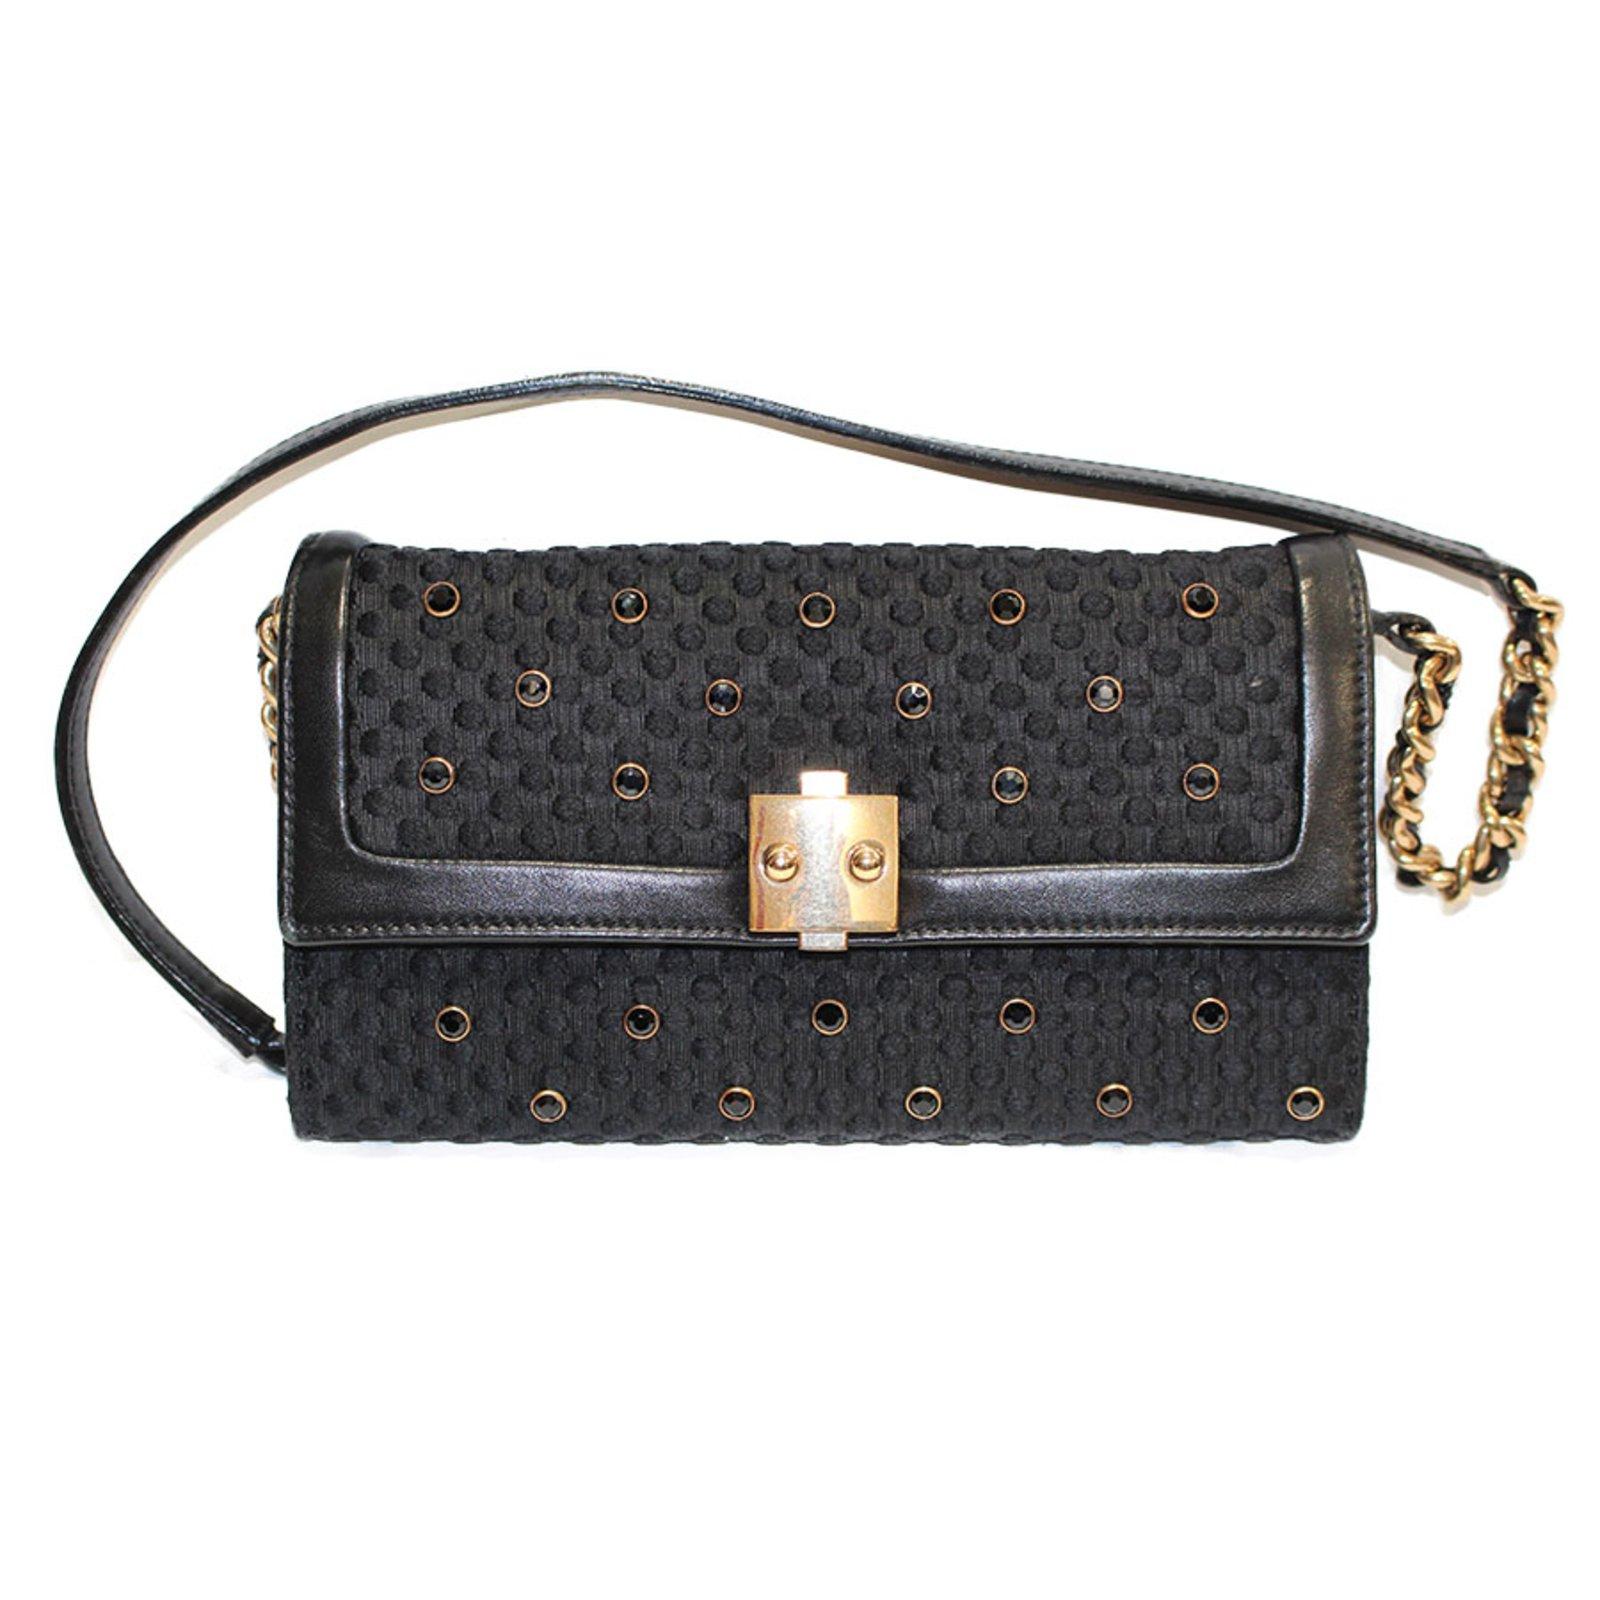 Marc Jacobs Black Swarovski Cristals Handbag Handbags Leather Cloth Golden Ref 33106